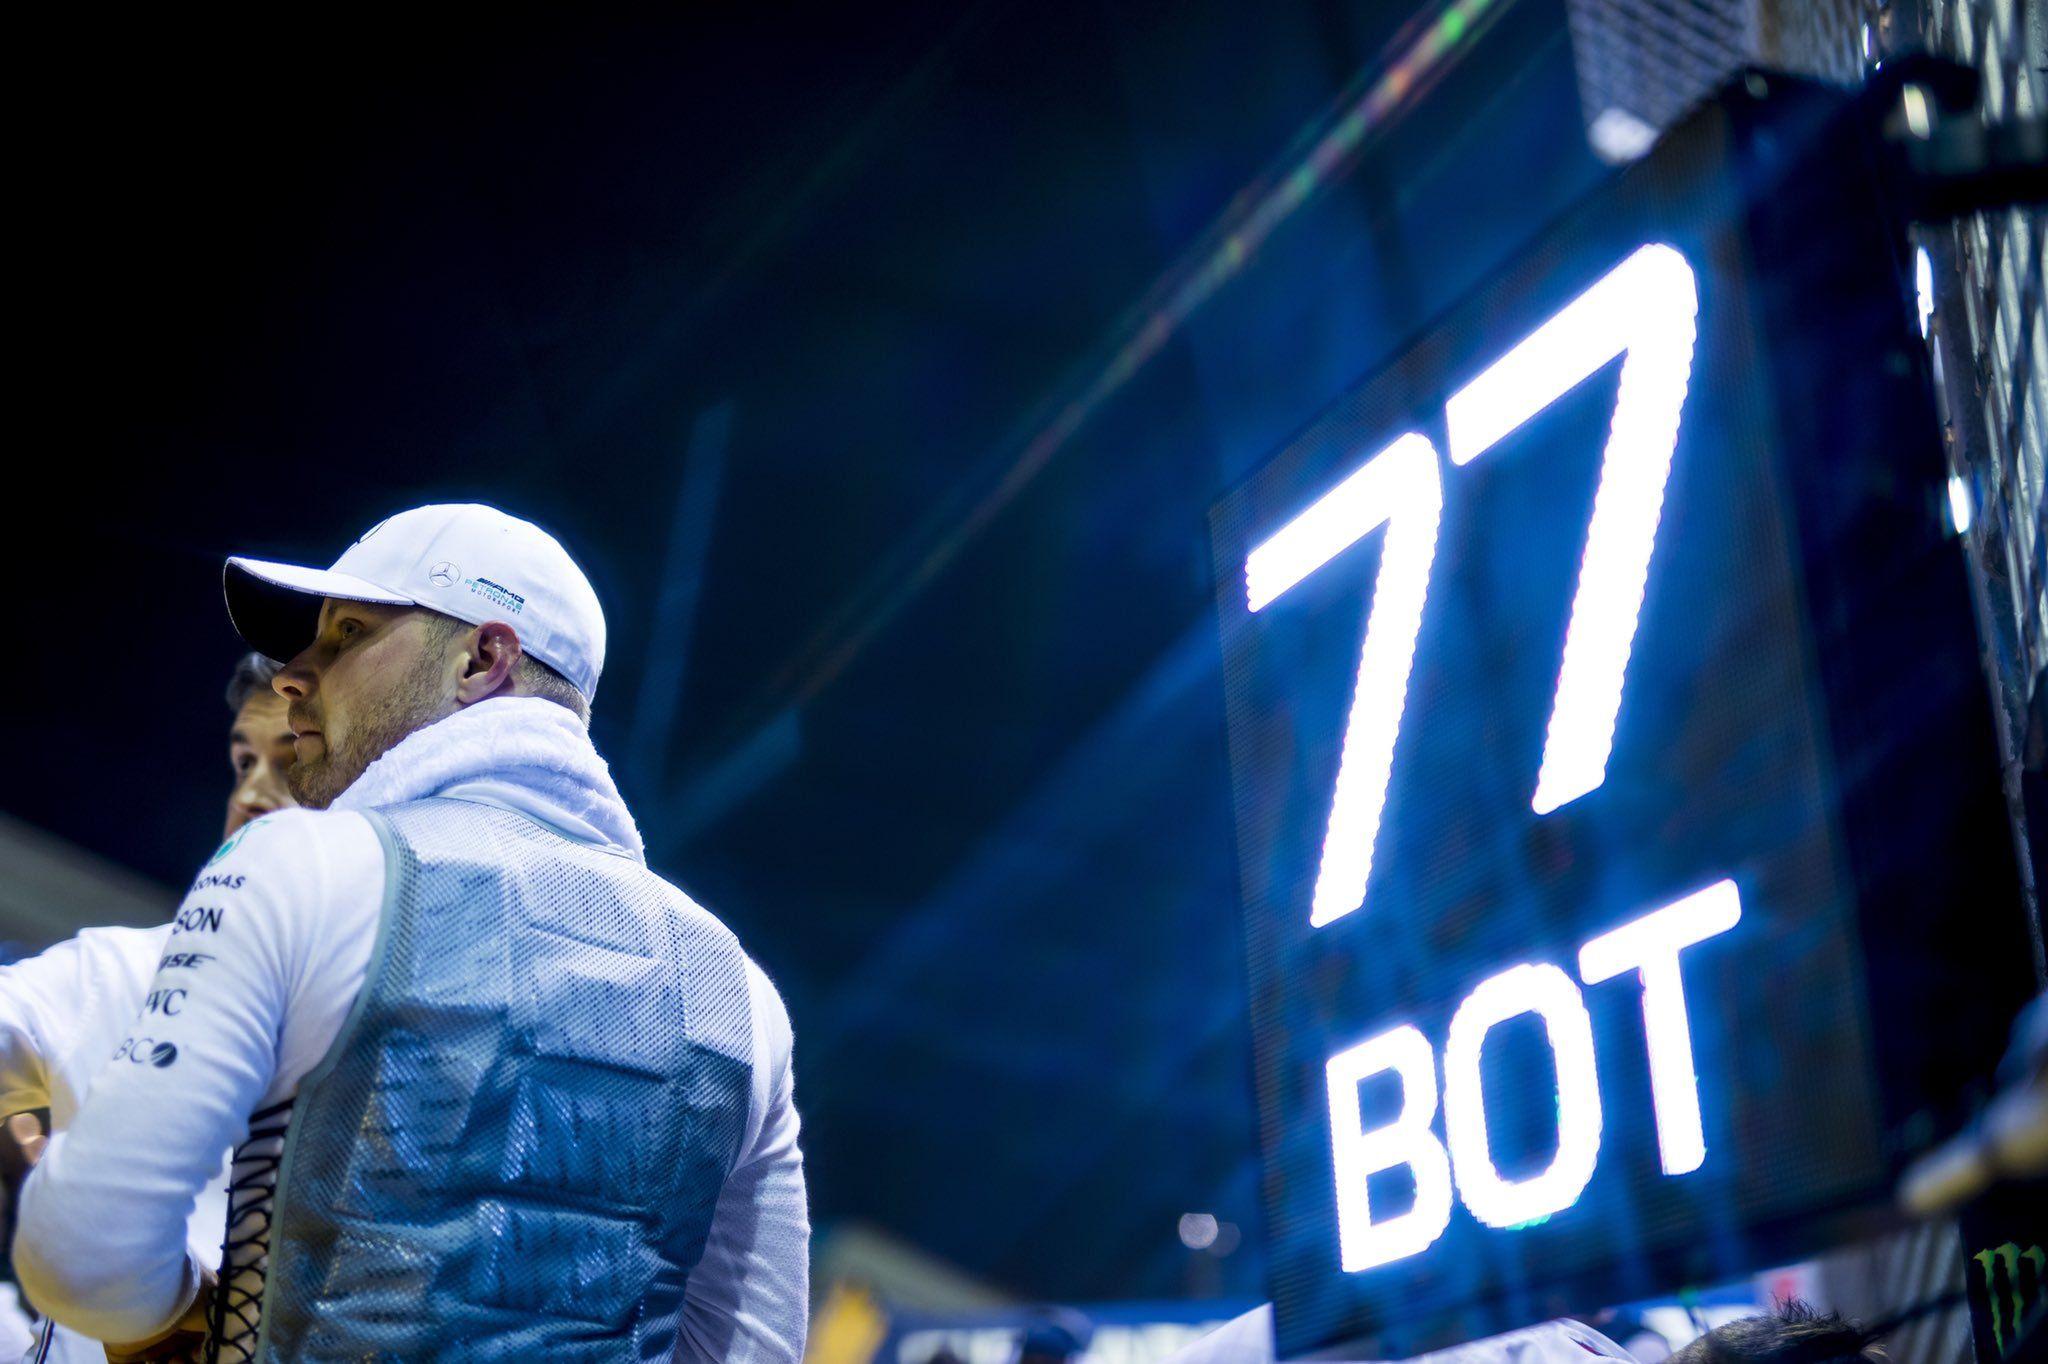 Valtteri Bottas, Podcast